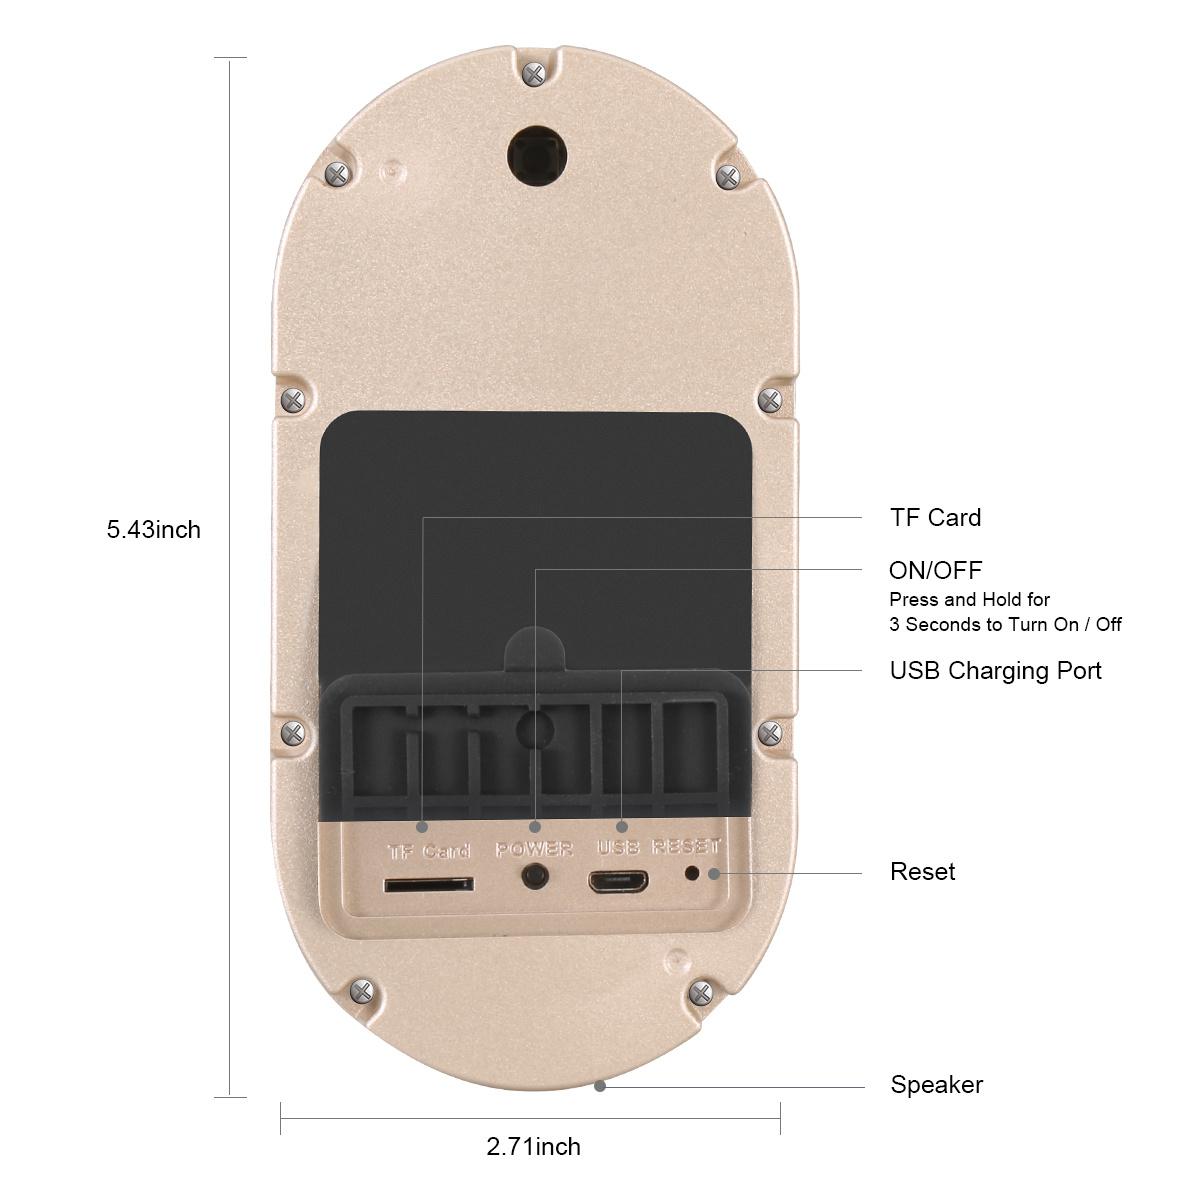 Battery Operated Wireless Security Door Cameras Remote Ring HD Phone Smart PIR Motion Sensor WiFi Video Doorbell